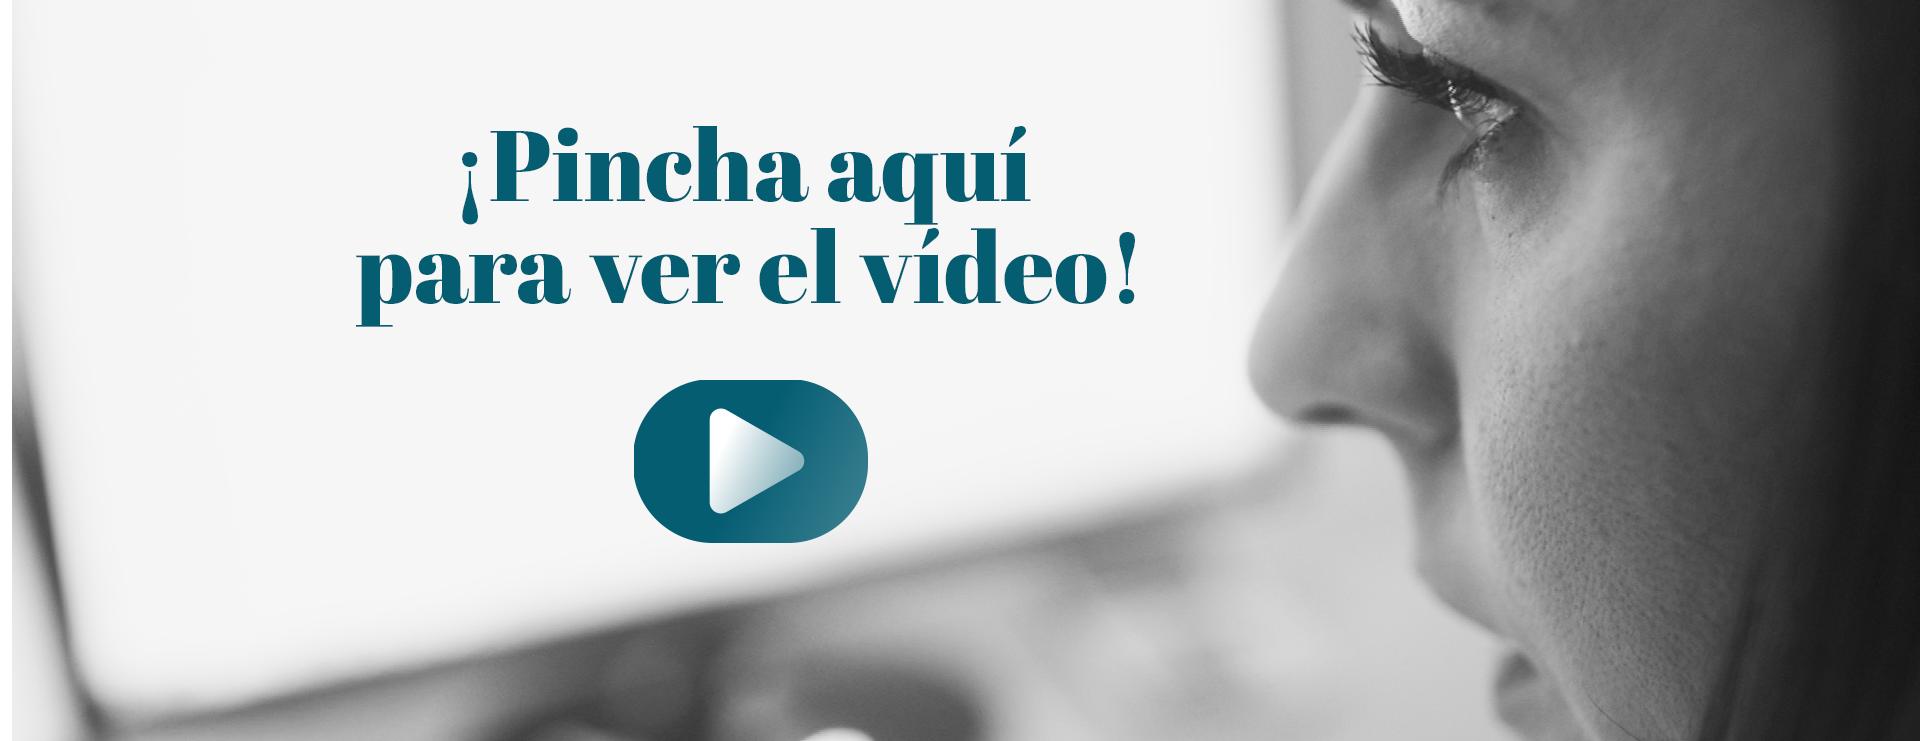 imagen-video-hover